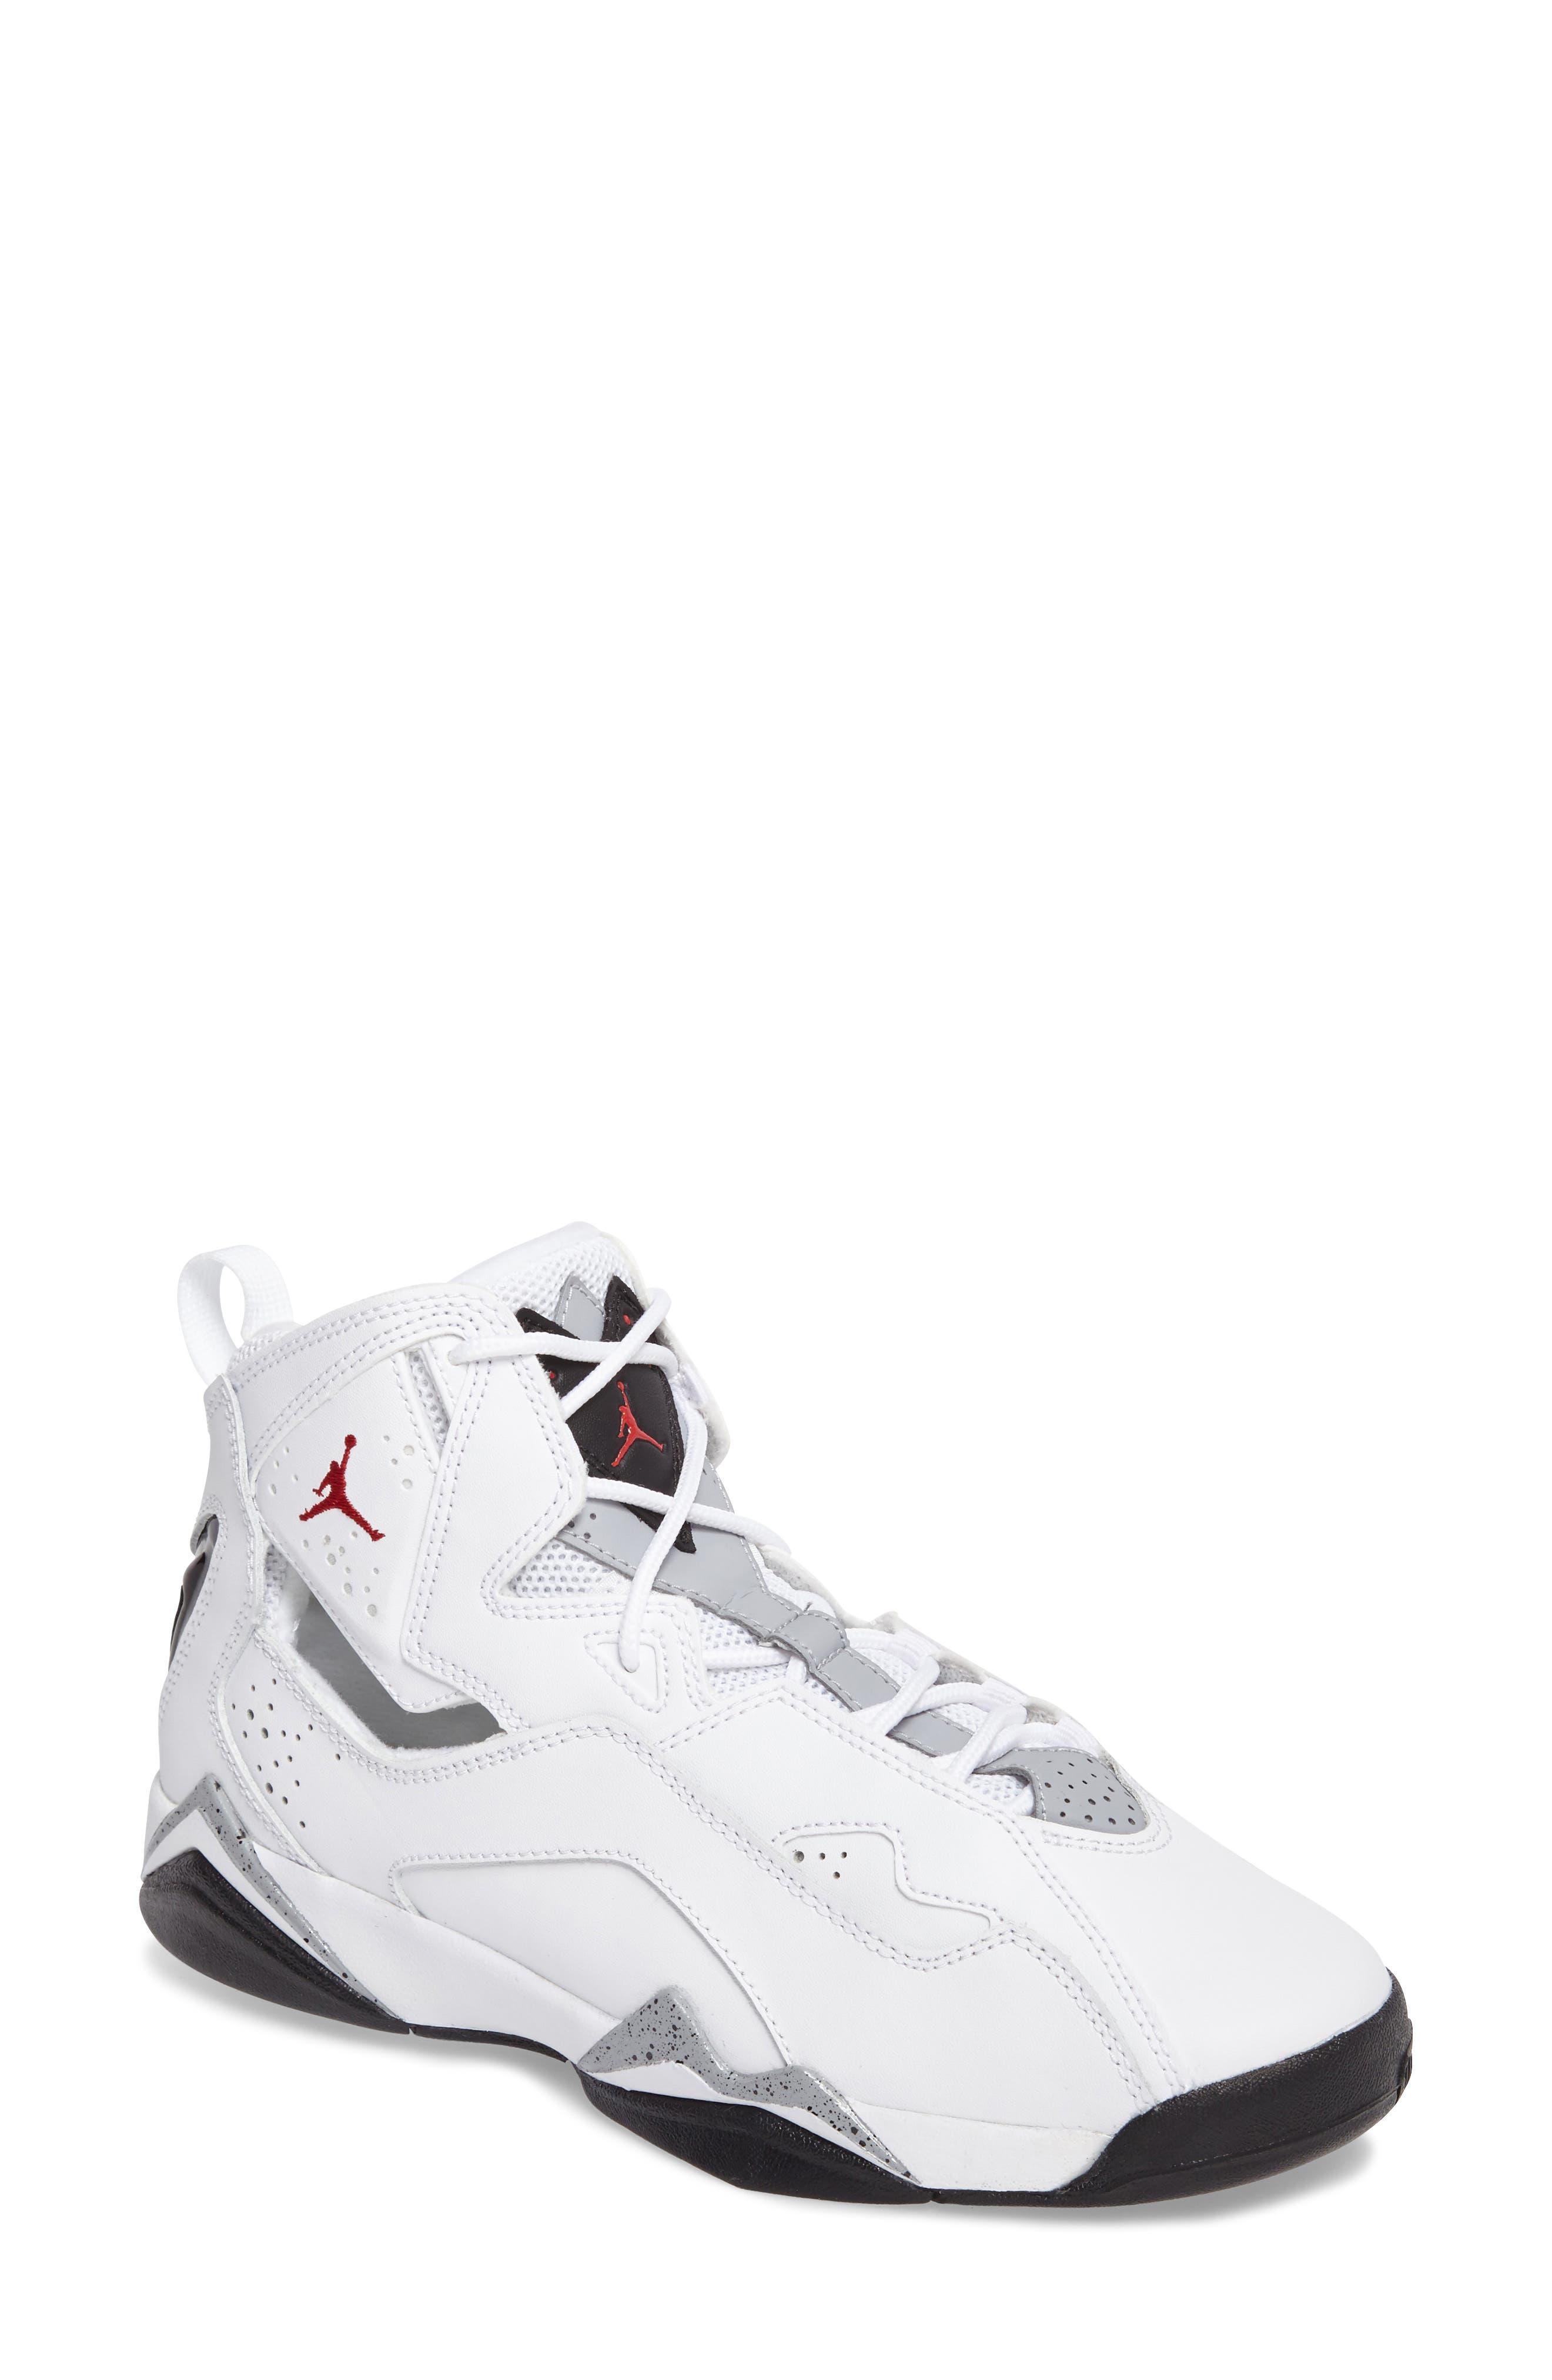 True Flight BG High Top Sneaker,                         Main,                         color, White/ Gym Red/ Wolf Grey